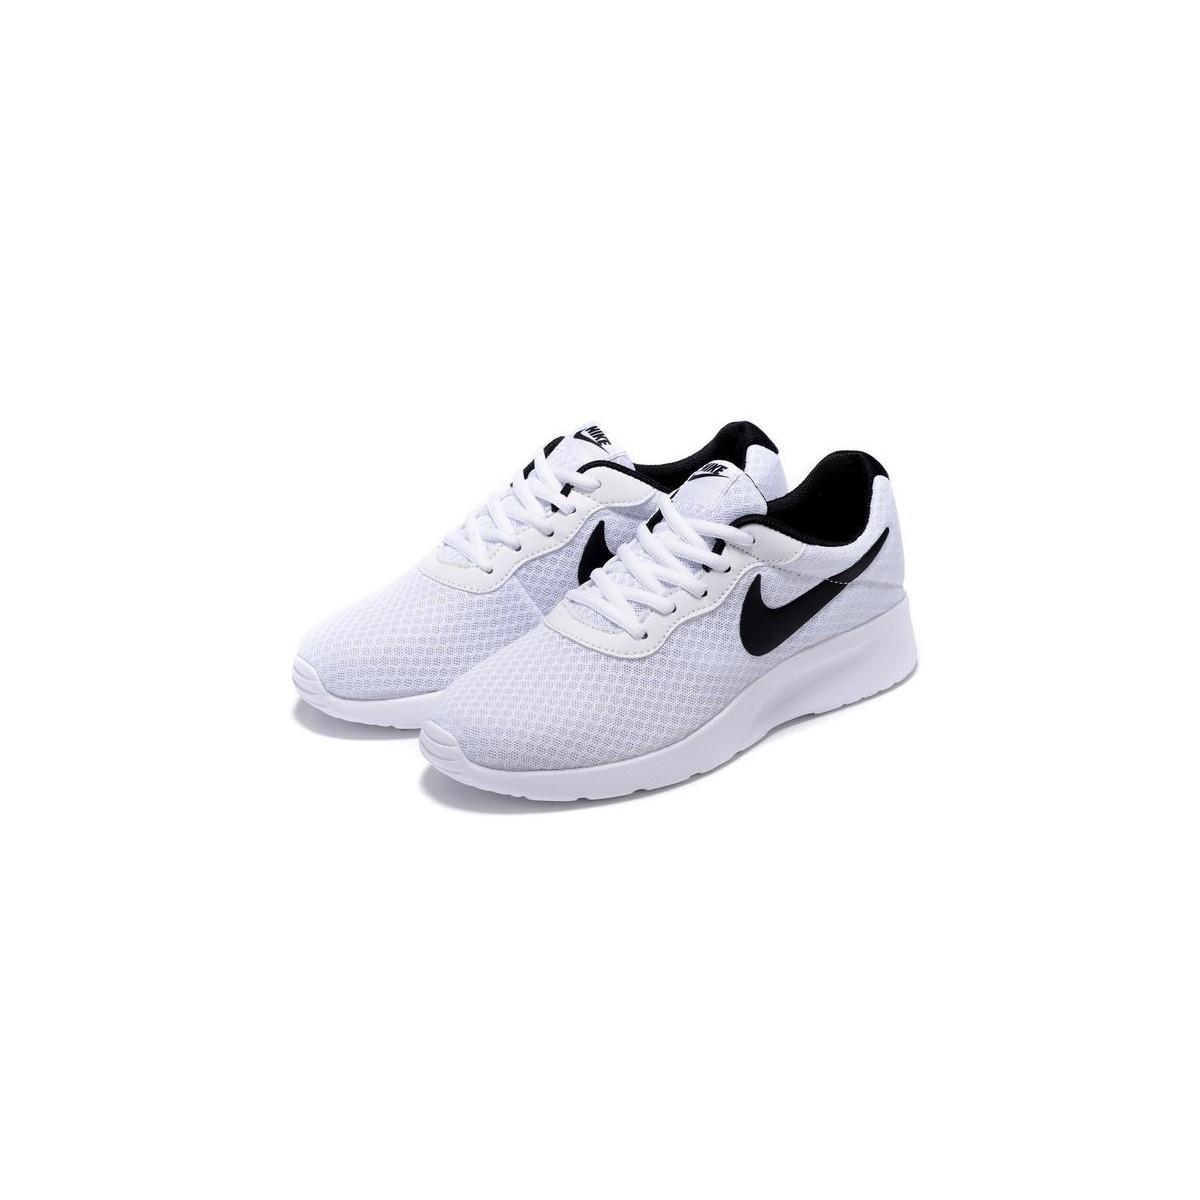 101 Blancas Zapatillas 812654 Nike Tanjun Hombre zXqw6a7